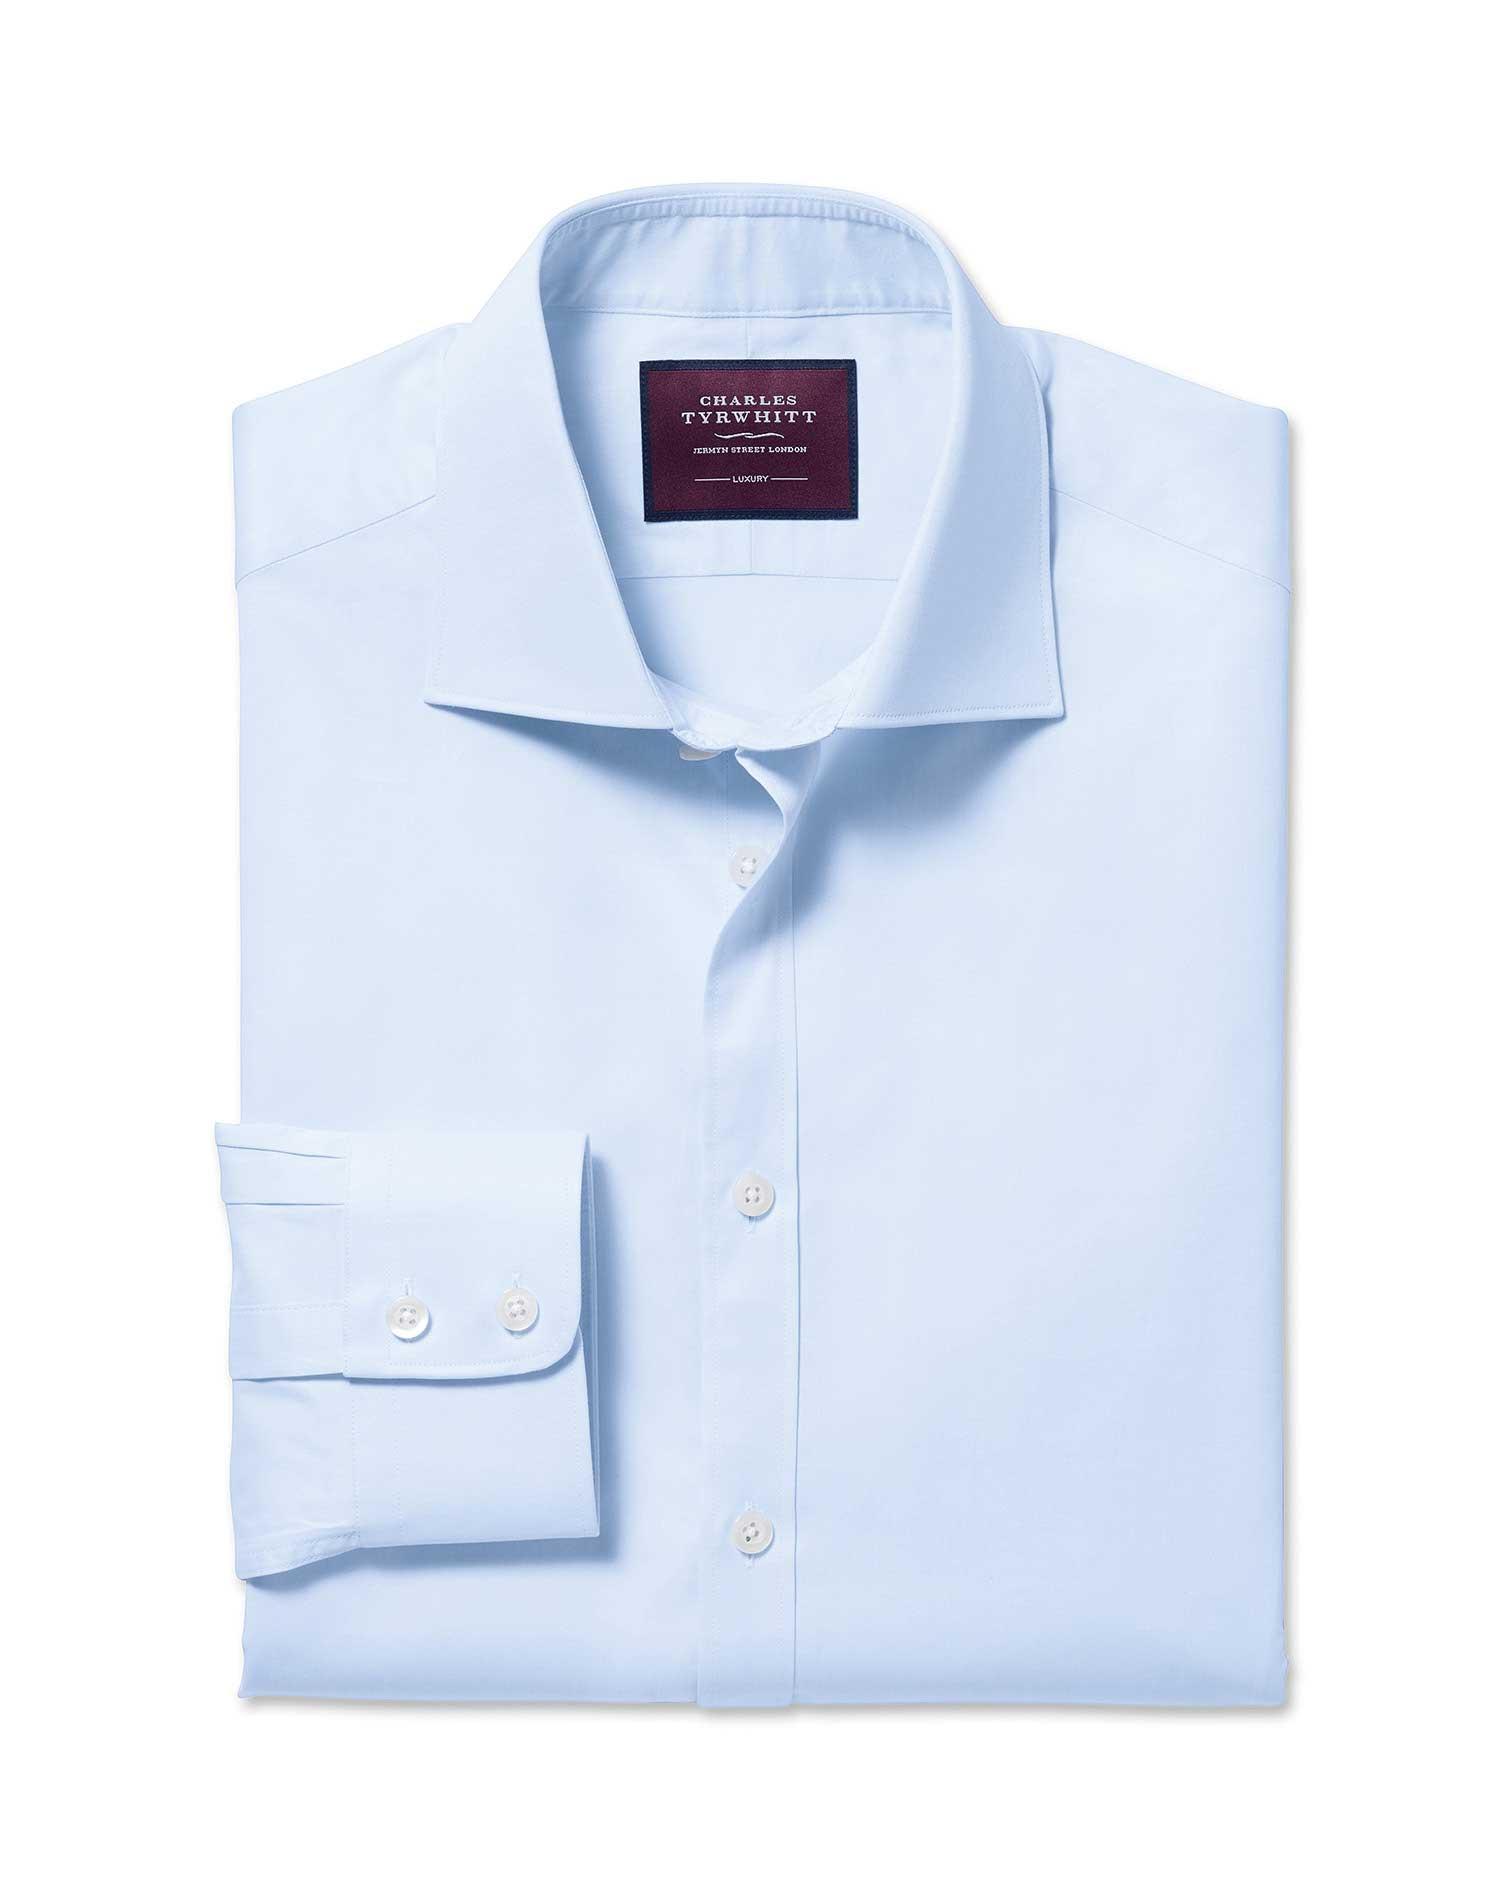 Extra Slim Fit Semi-Cutaway Luxury Twill Light Blue Egyptian Cotton Formal Shirt Single Cuff Size 15